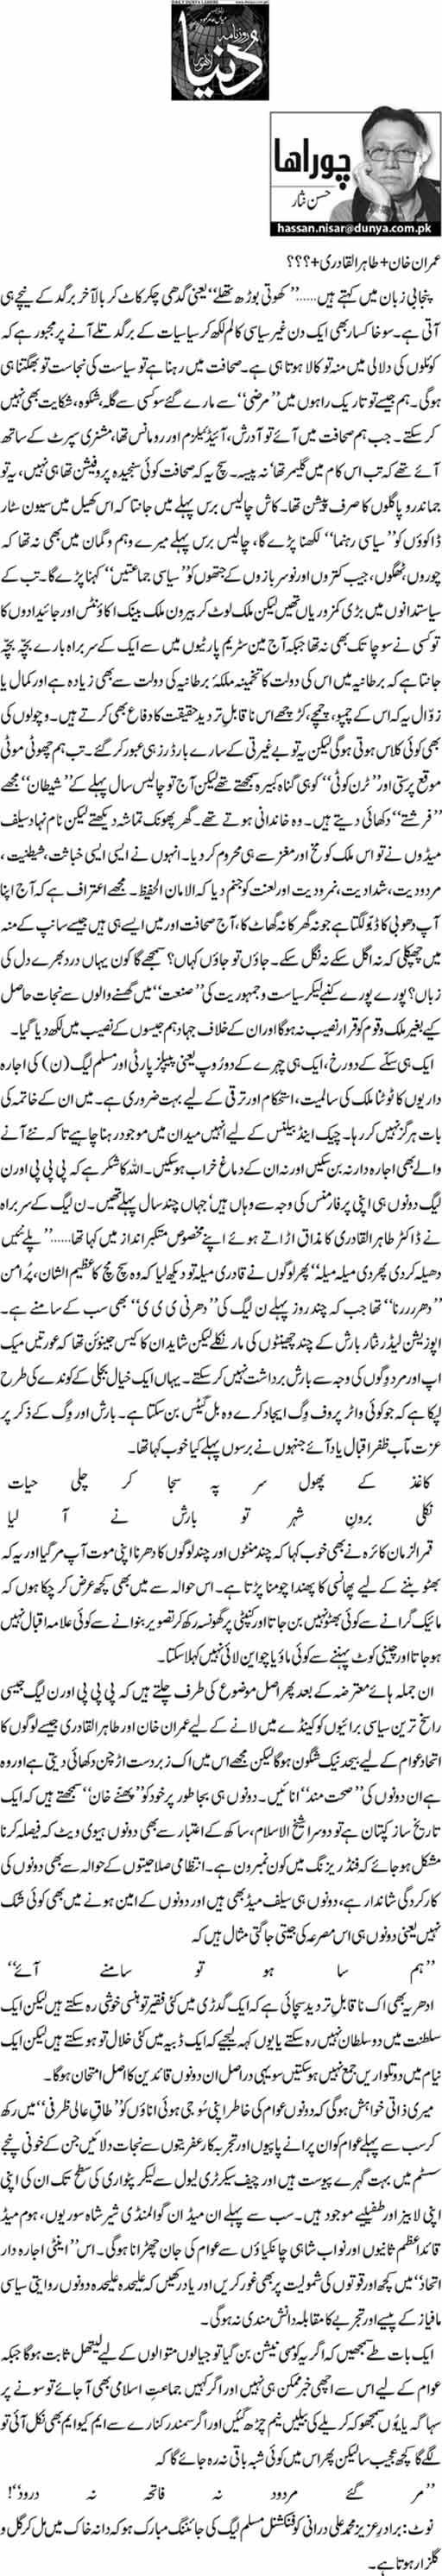 Imran Khan+Tahir ul Qadri+??? - Hassan Nisar